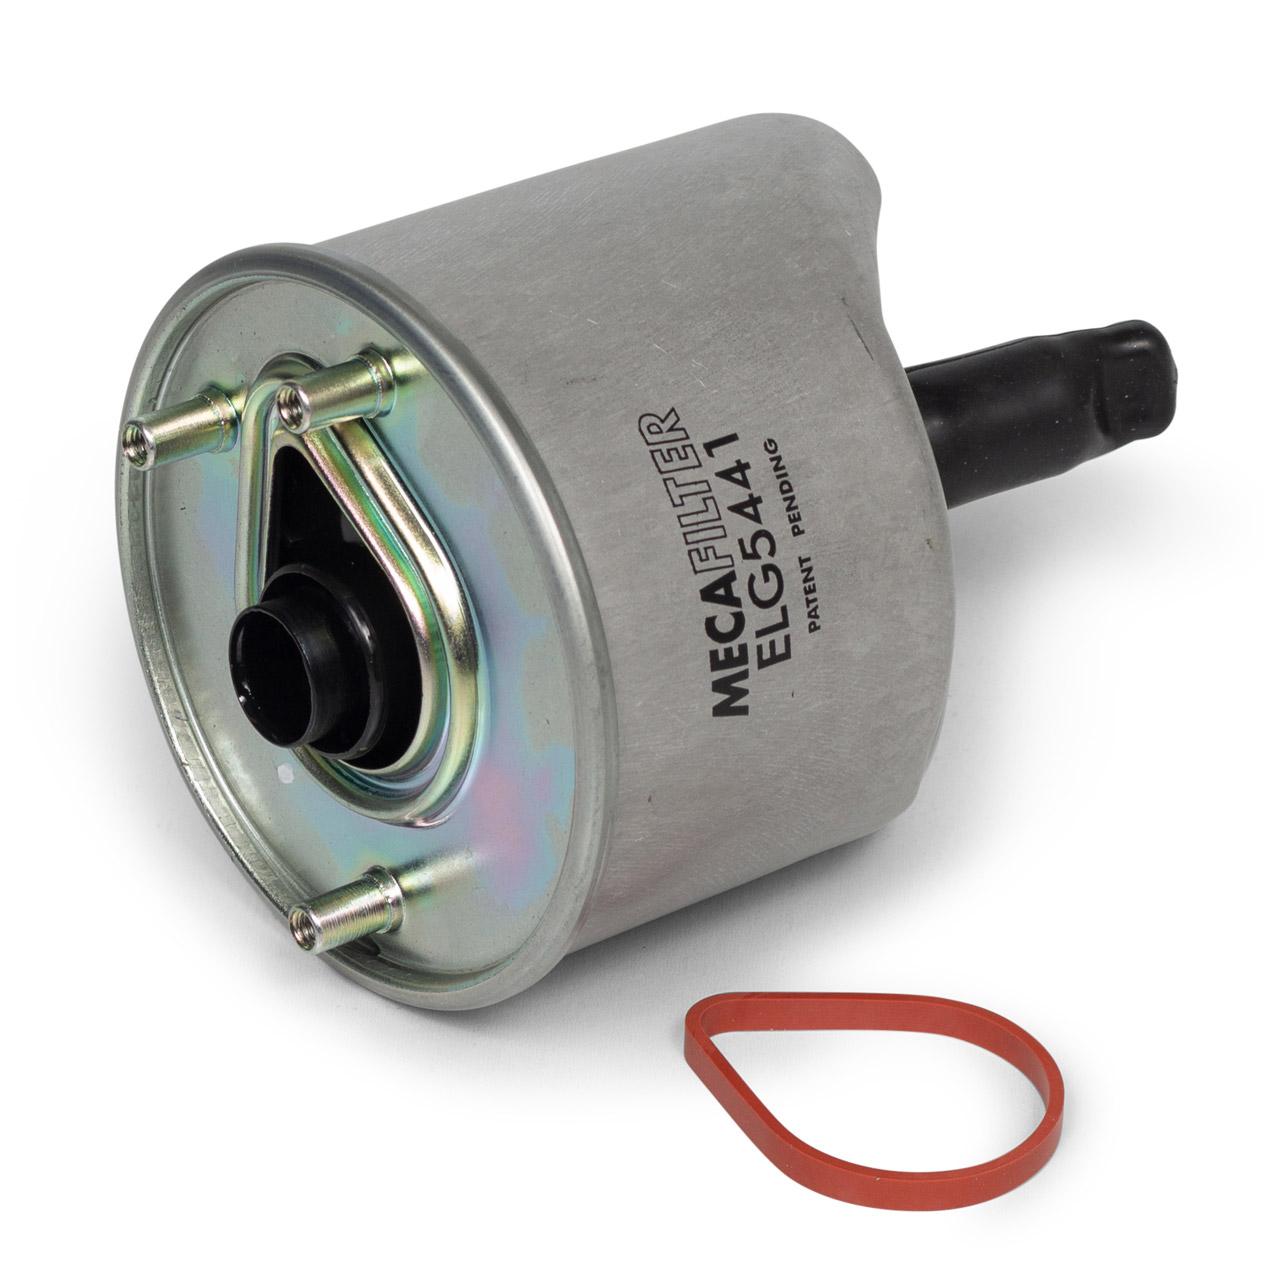 MECAFILTER Kraftstofffilter Dieselfilter FORD Focus III Mondeo IV V 1.4-1.6 TDCi 1780195